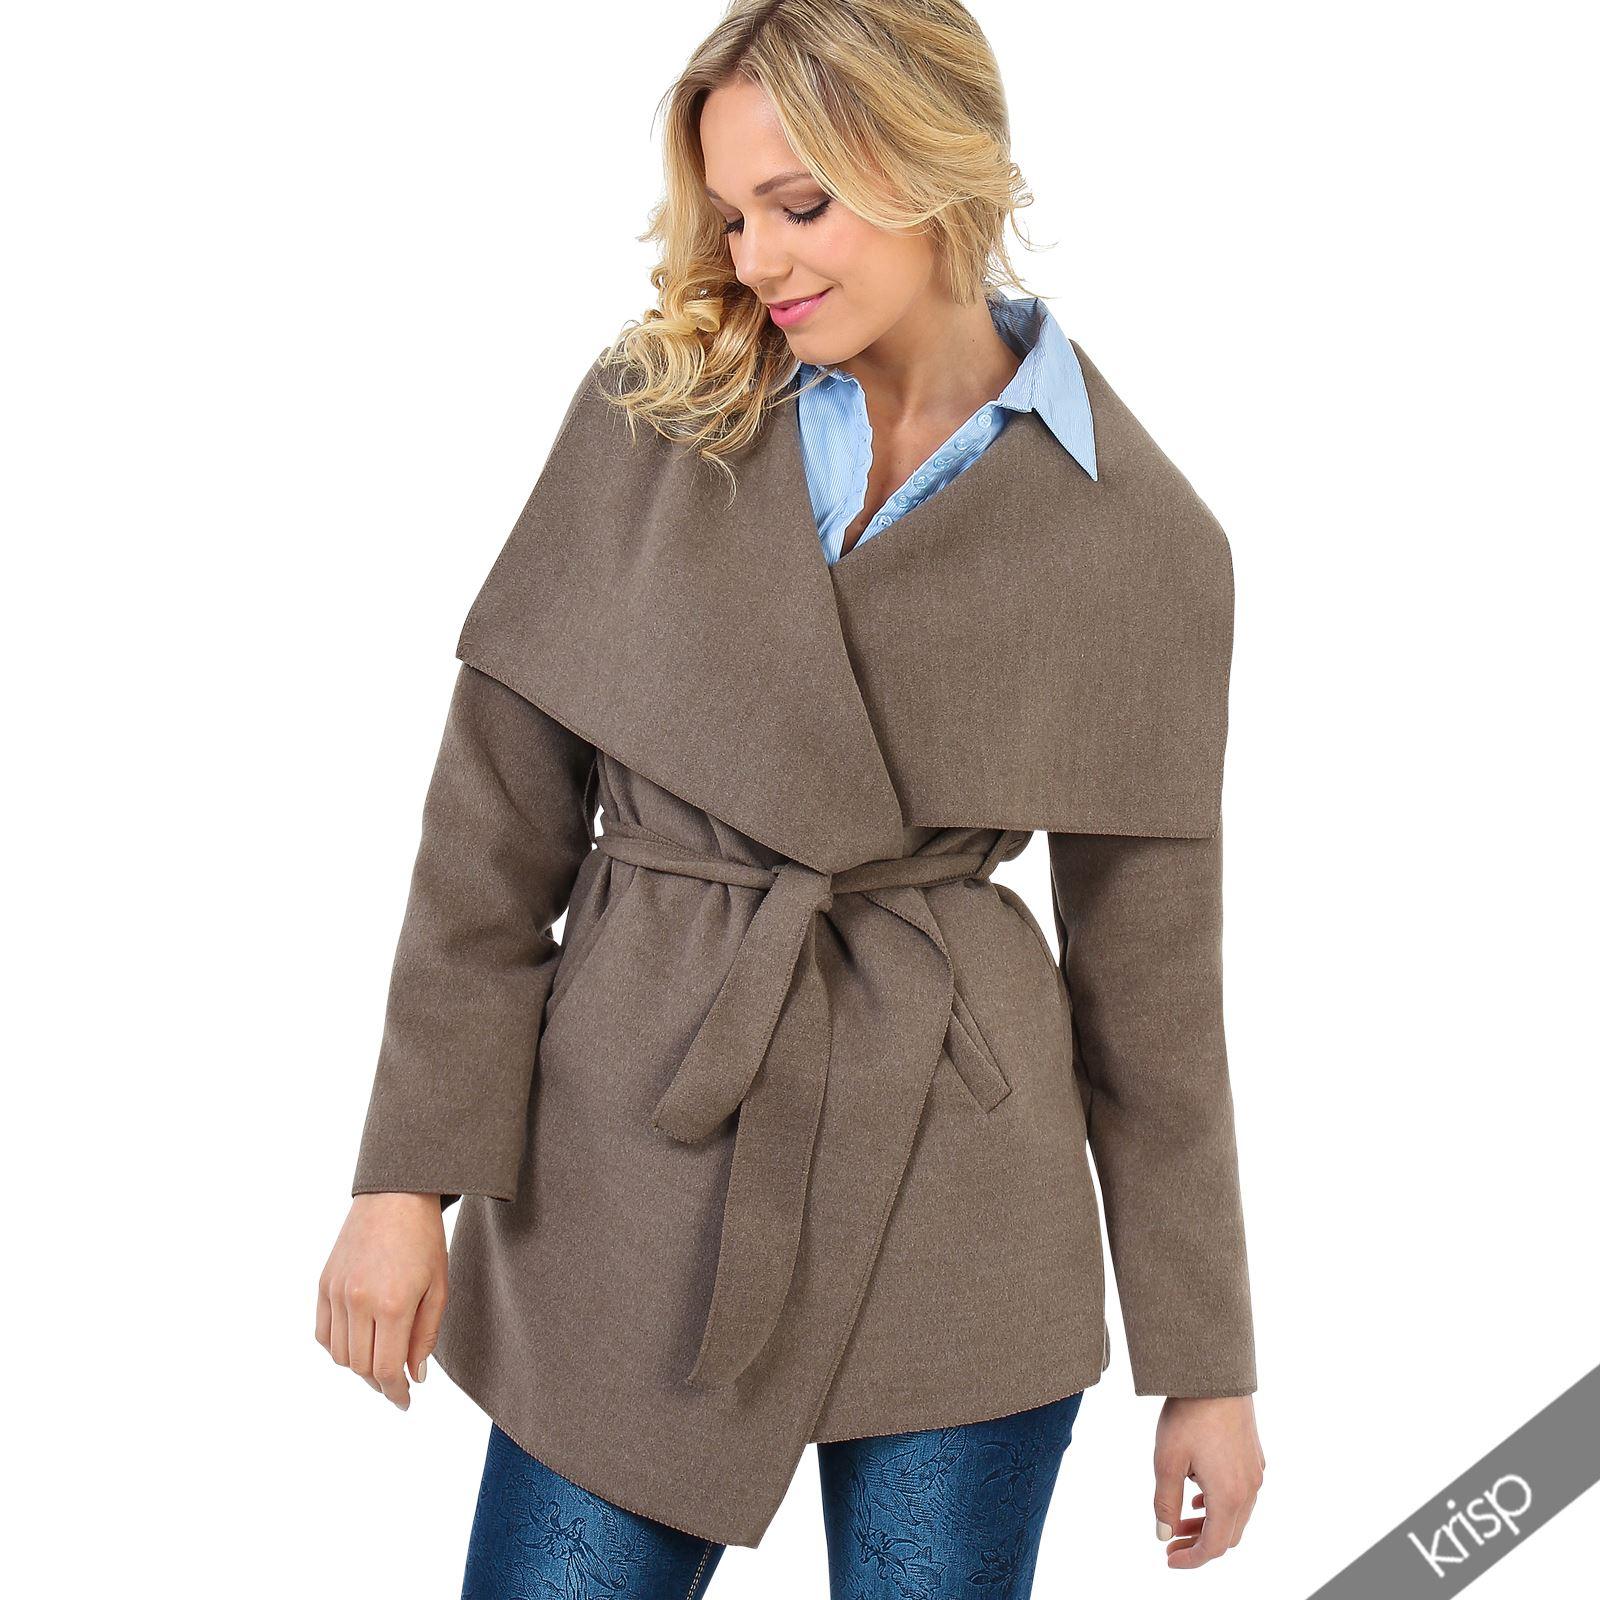 damen kurzer mantel fleece jacke cardigan cape